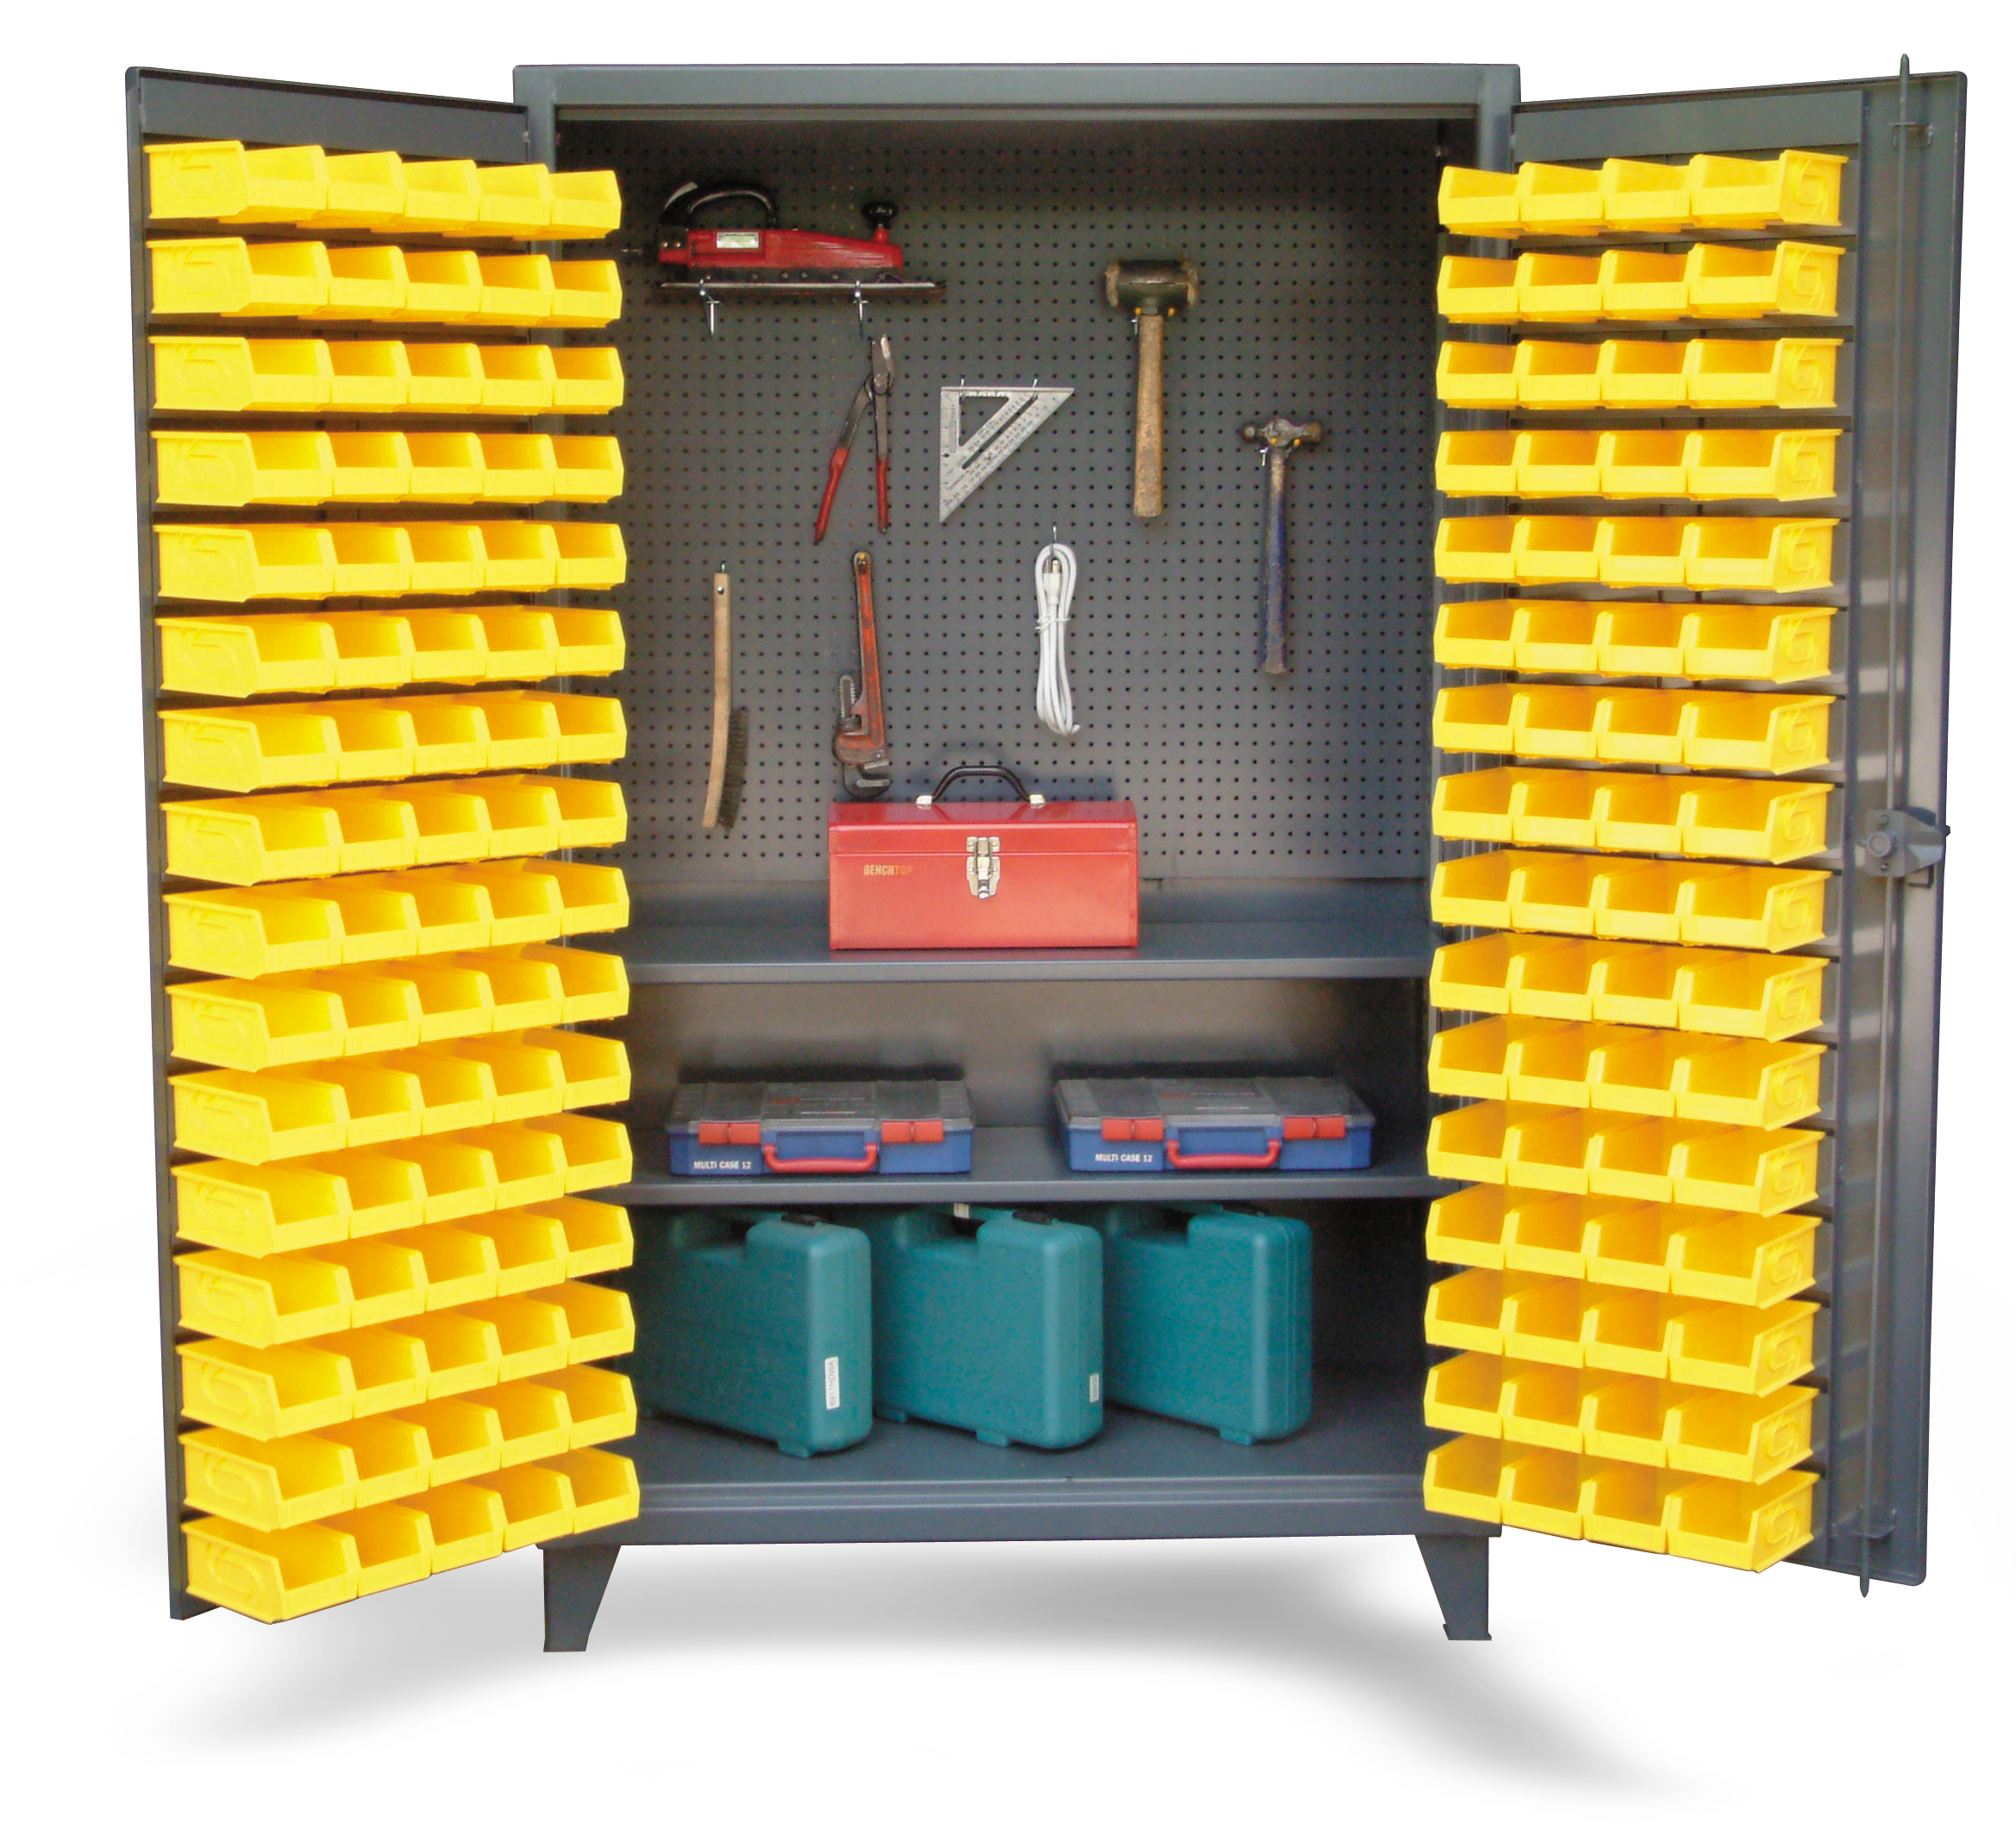 upright tool storage bin cabinet - bin cabinet with pegboard back and ACOABIN